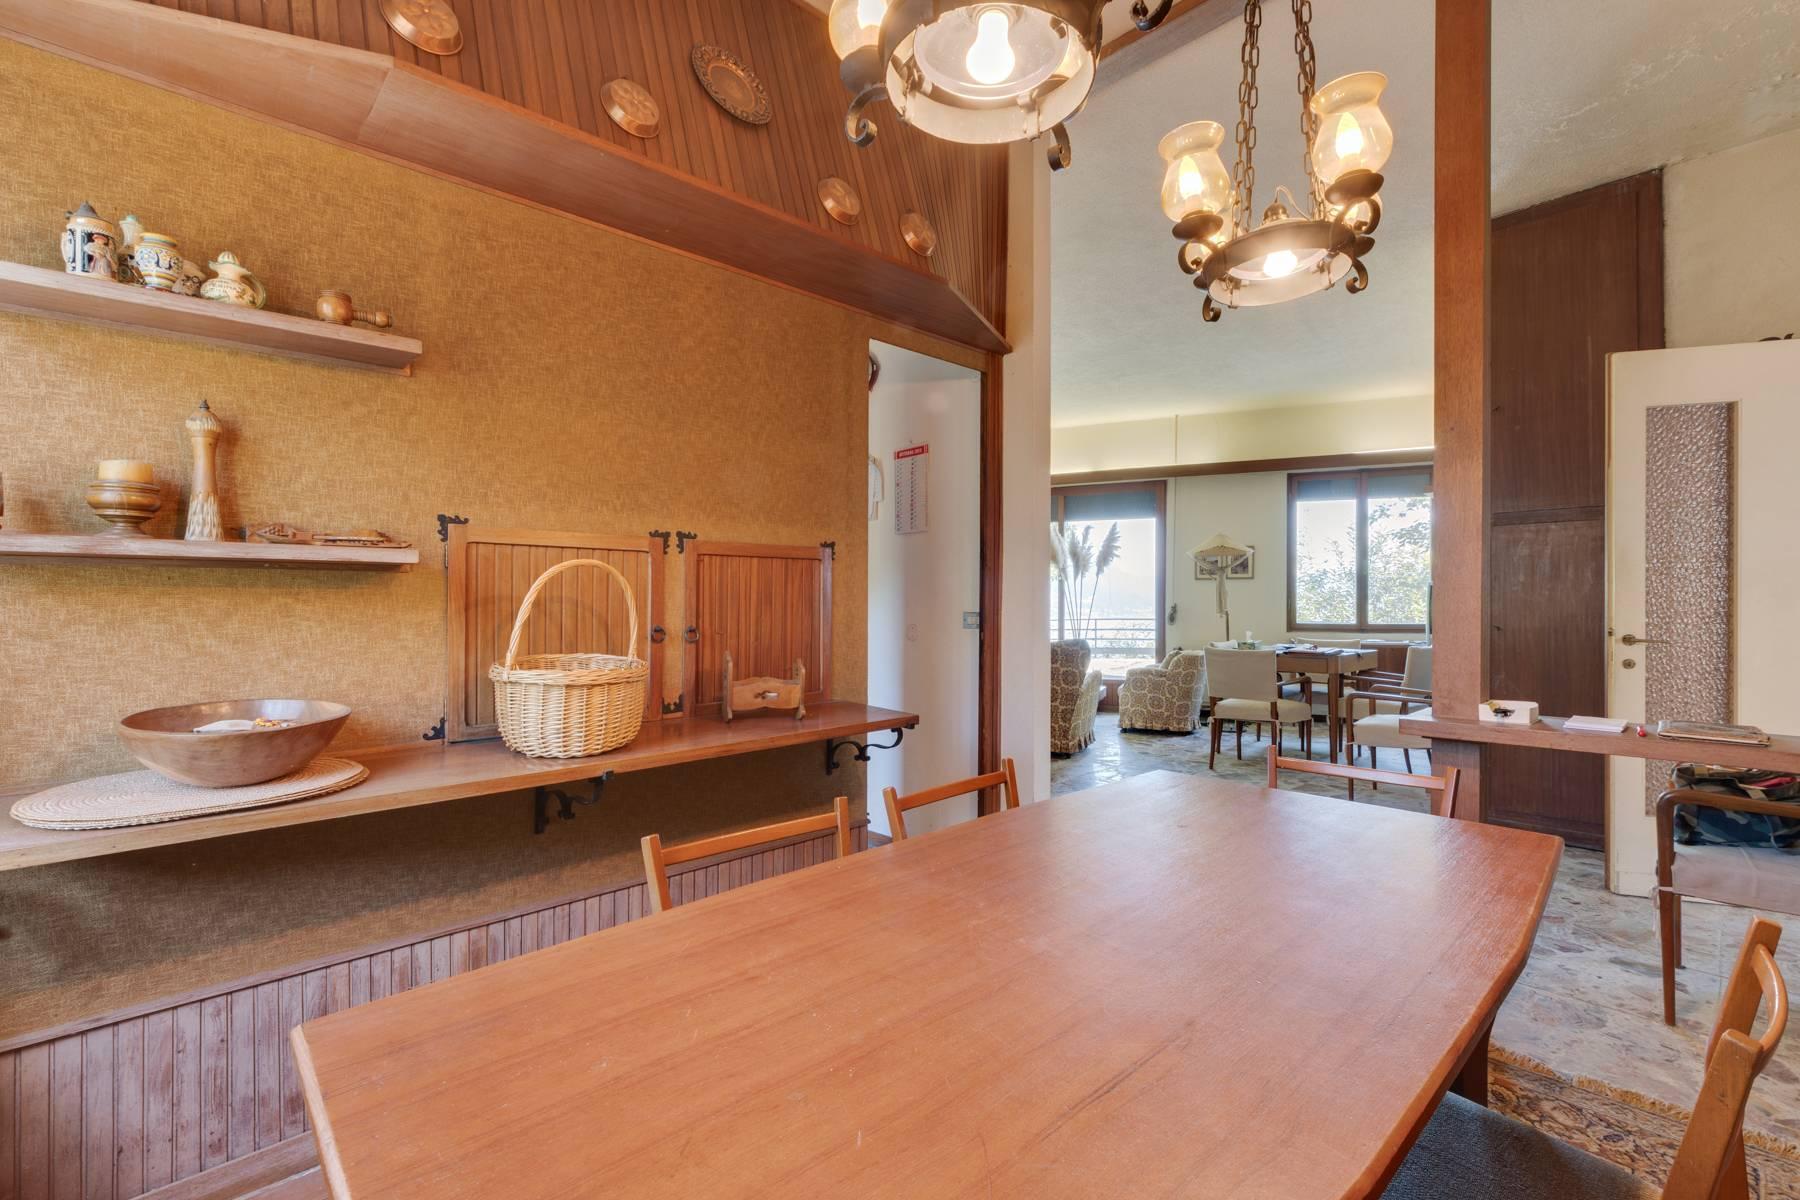 Villa in Vendita a Stresa: 5 locali, 150 mq - Foto 12